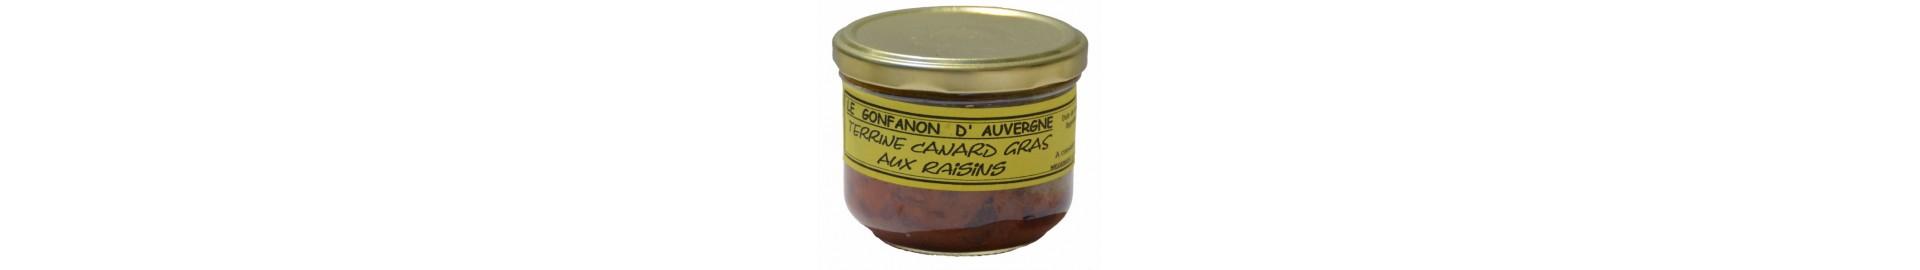 Terrines de Canard & Foie Gras